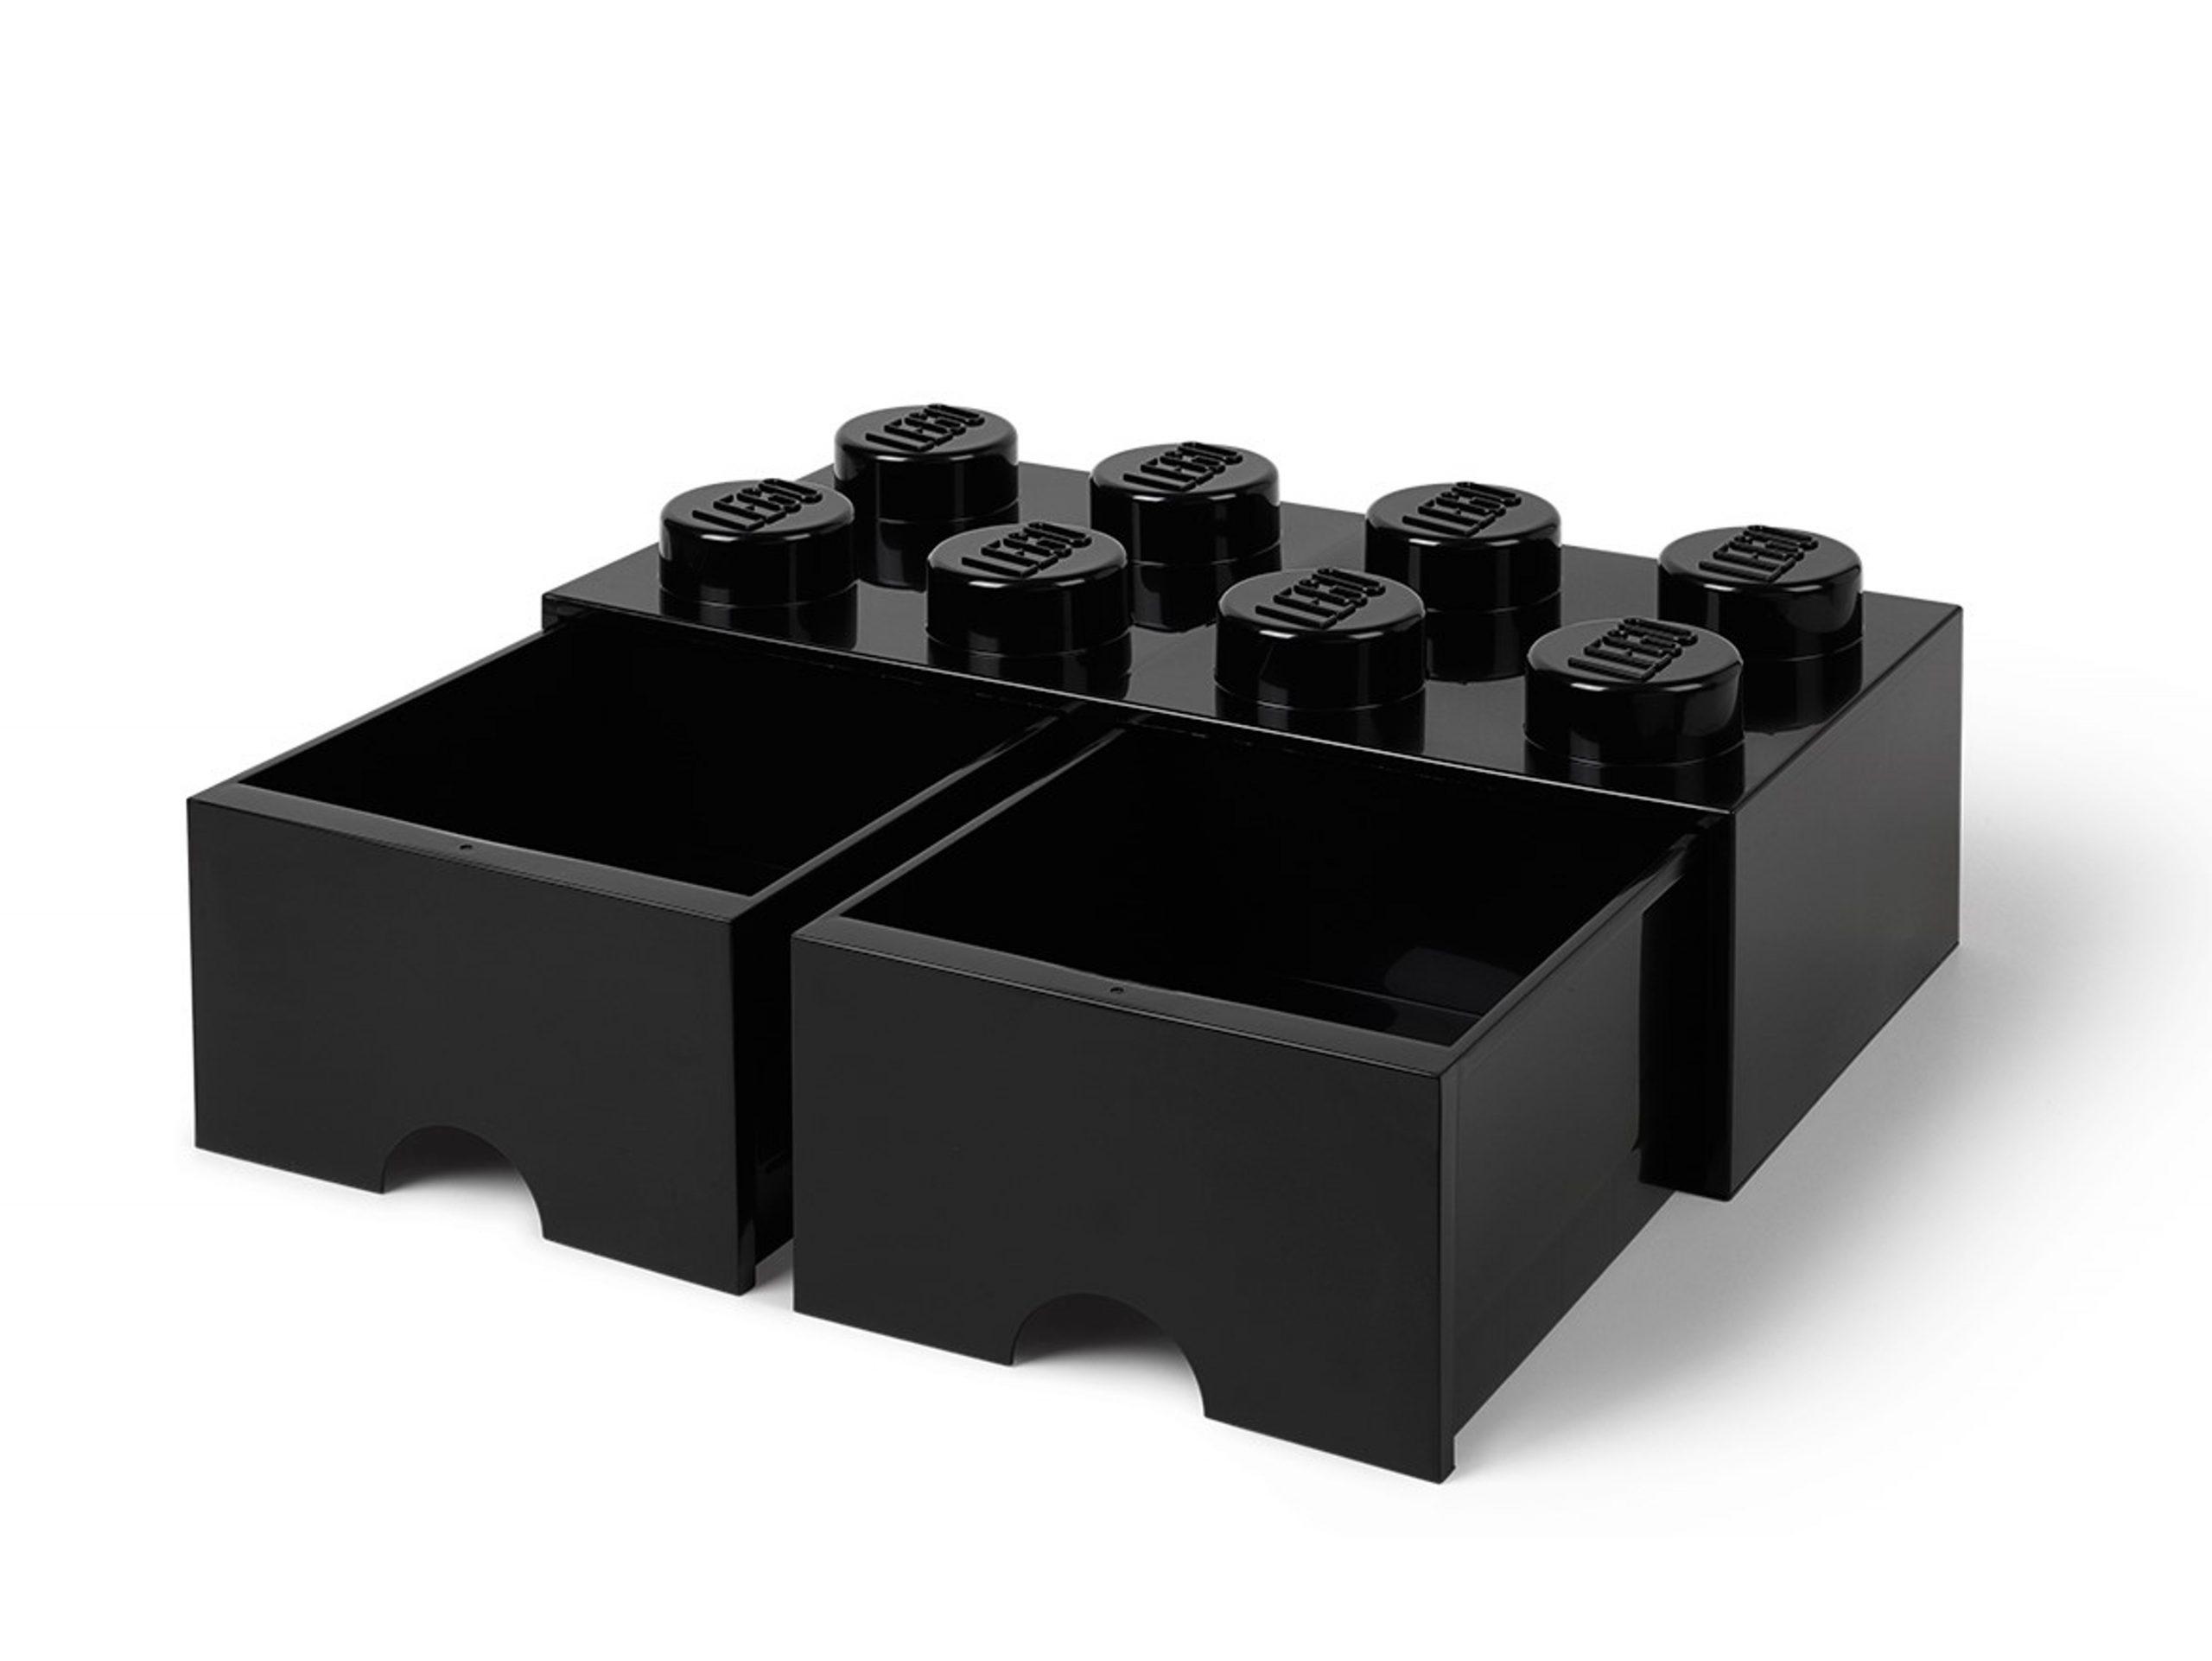 lego 5005718 8 stud black storage brick drawer scaled